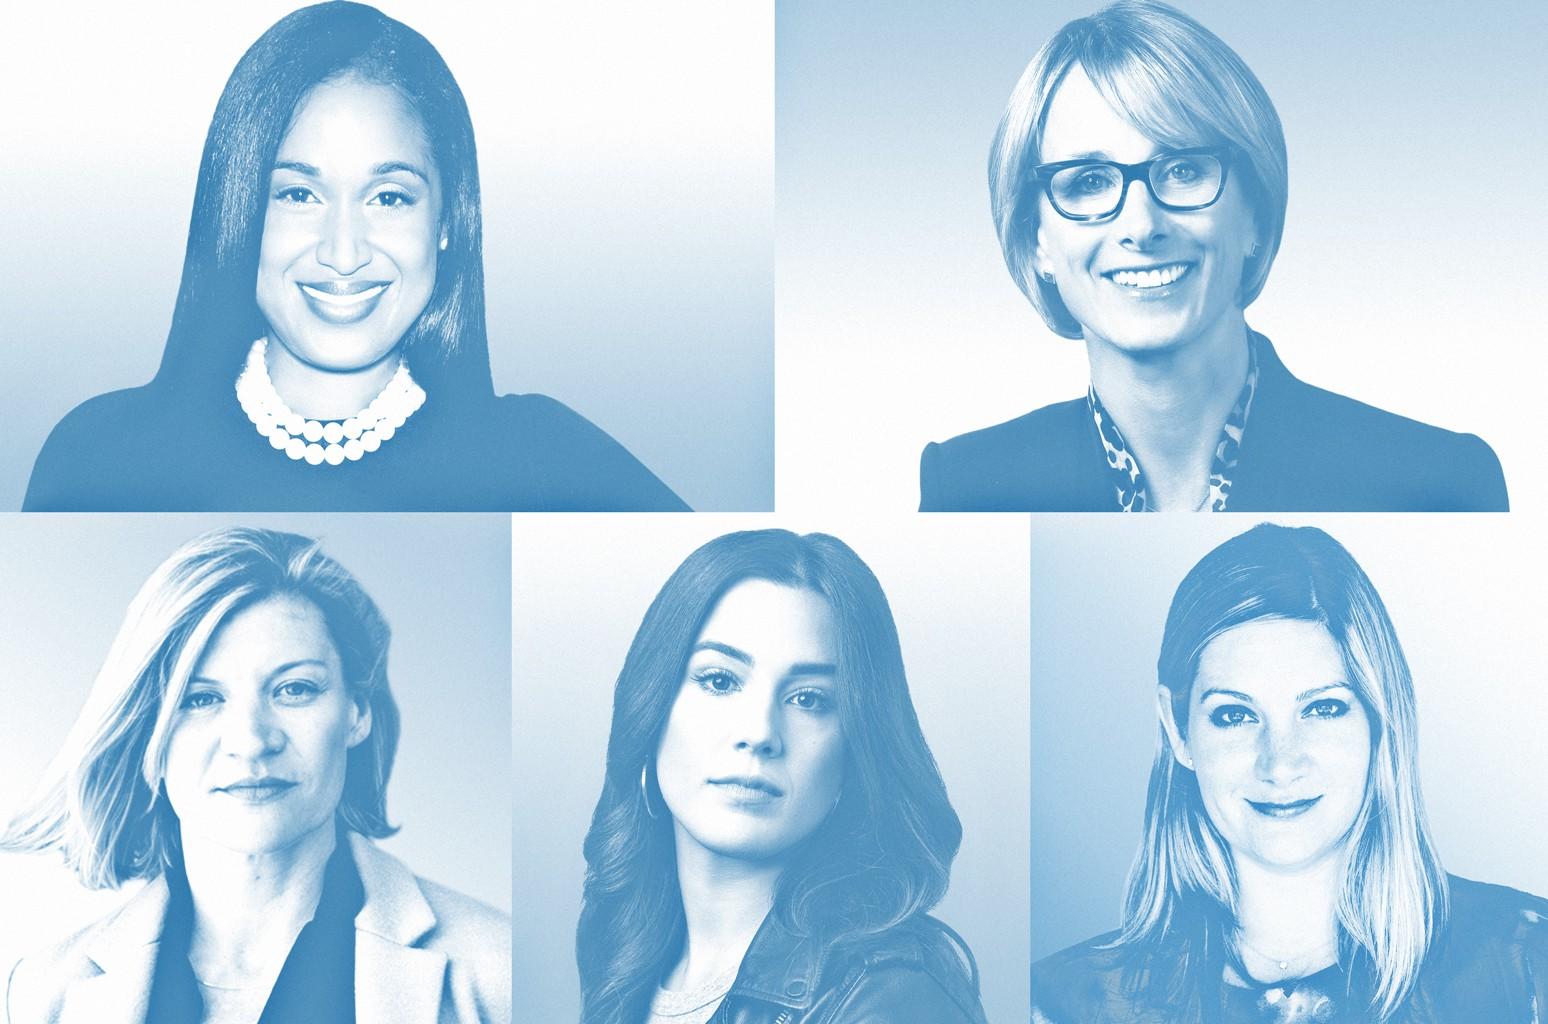 Traci Adams, Lisa Licht, Erika Savage, Nicole Nolletti & Danielle Madeira